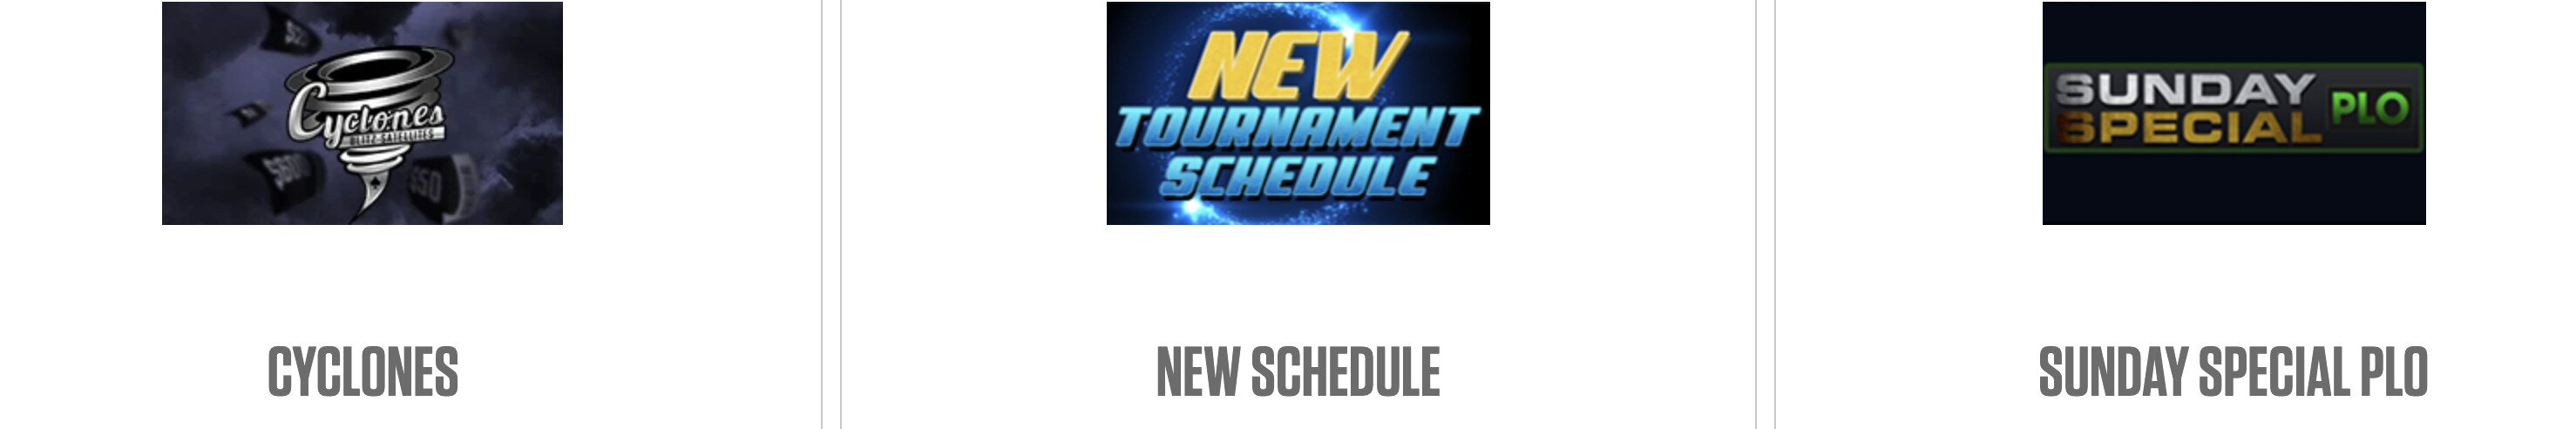 Americas Cardroom Tournaments